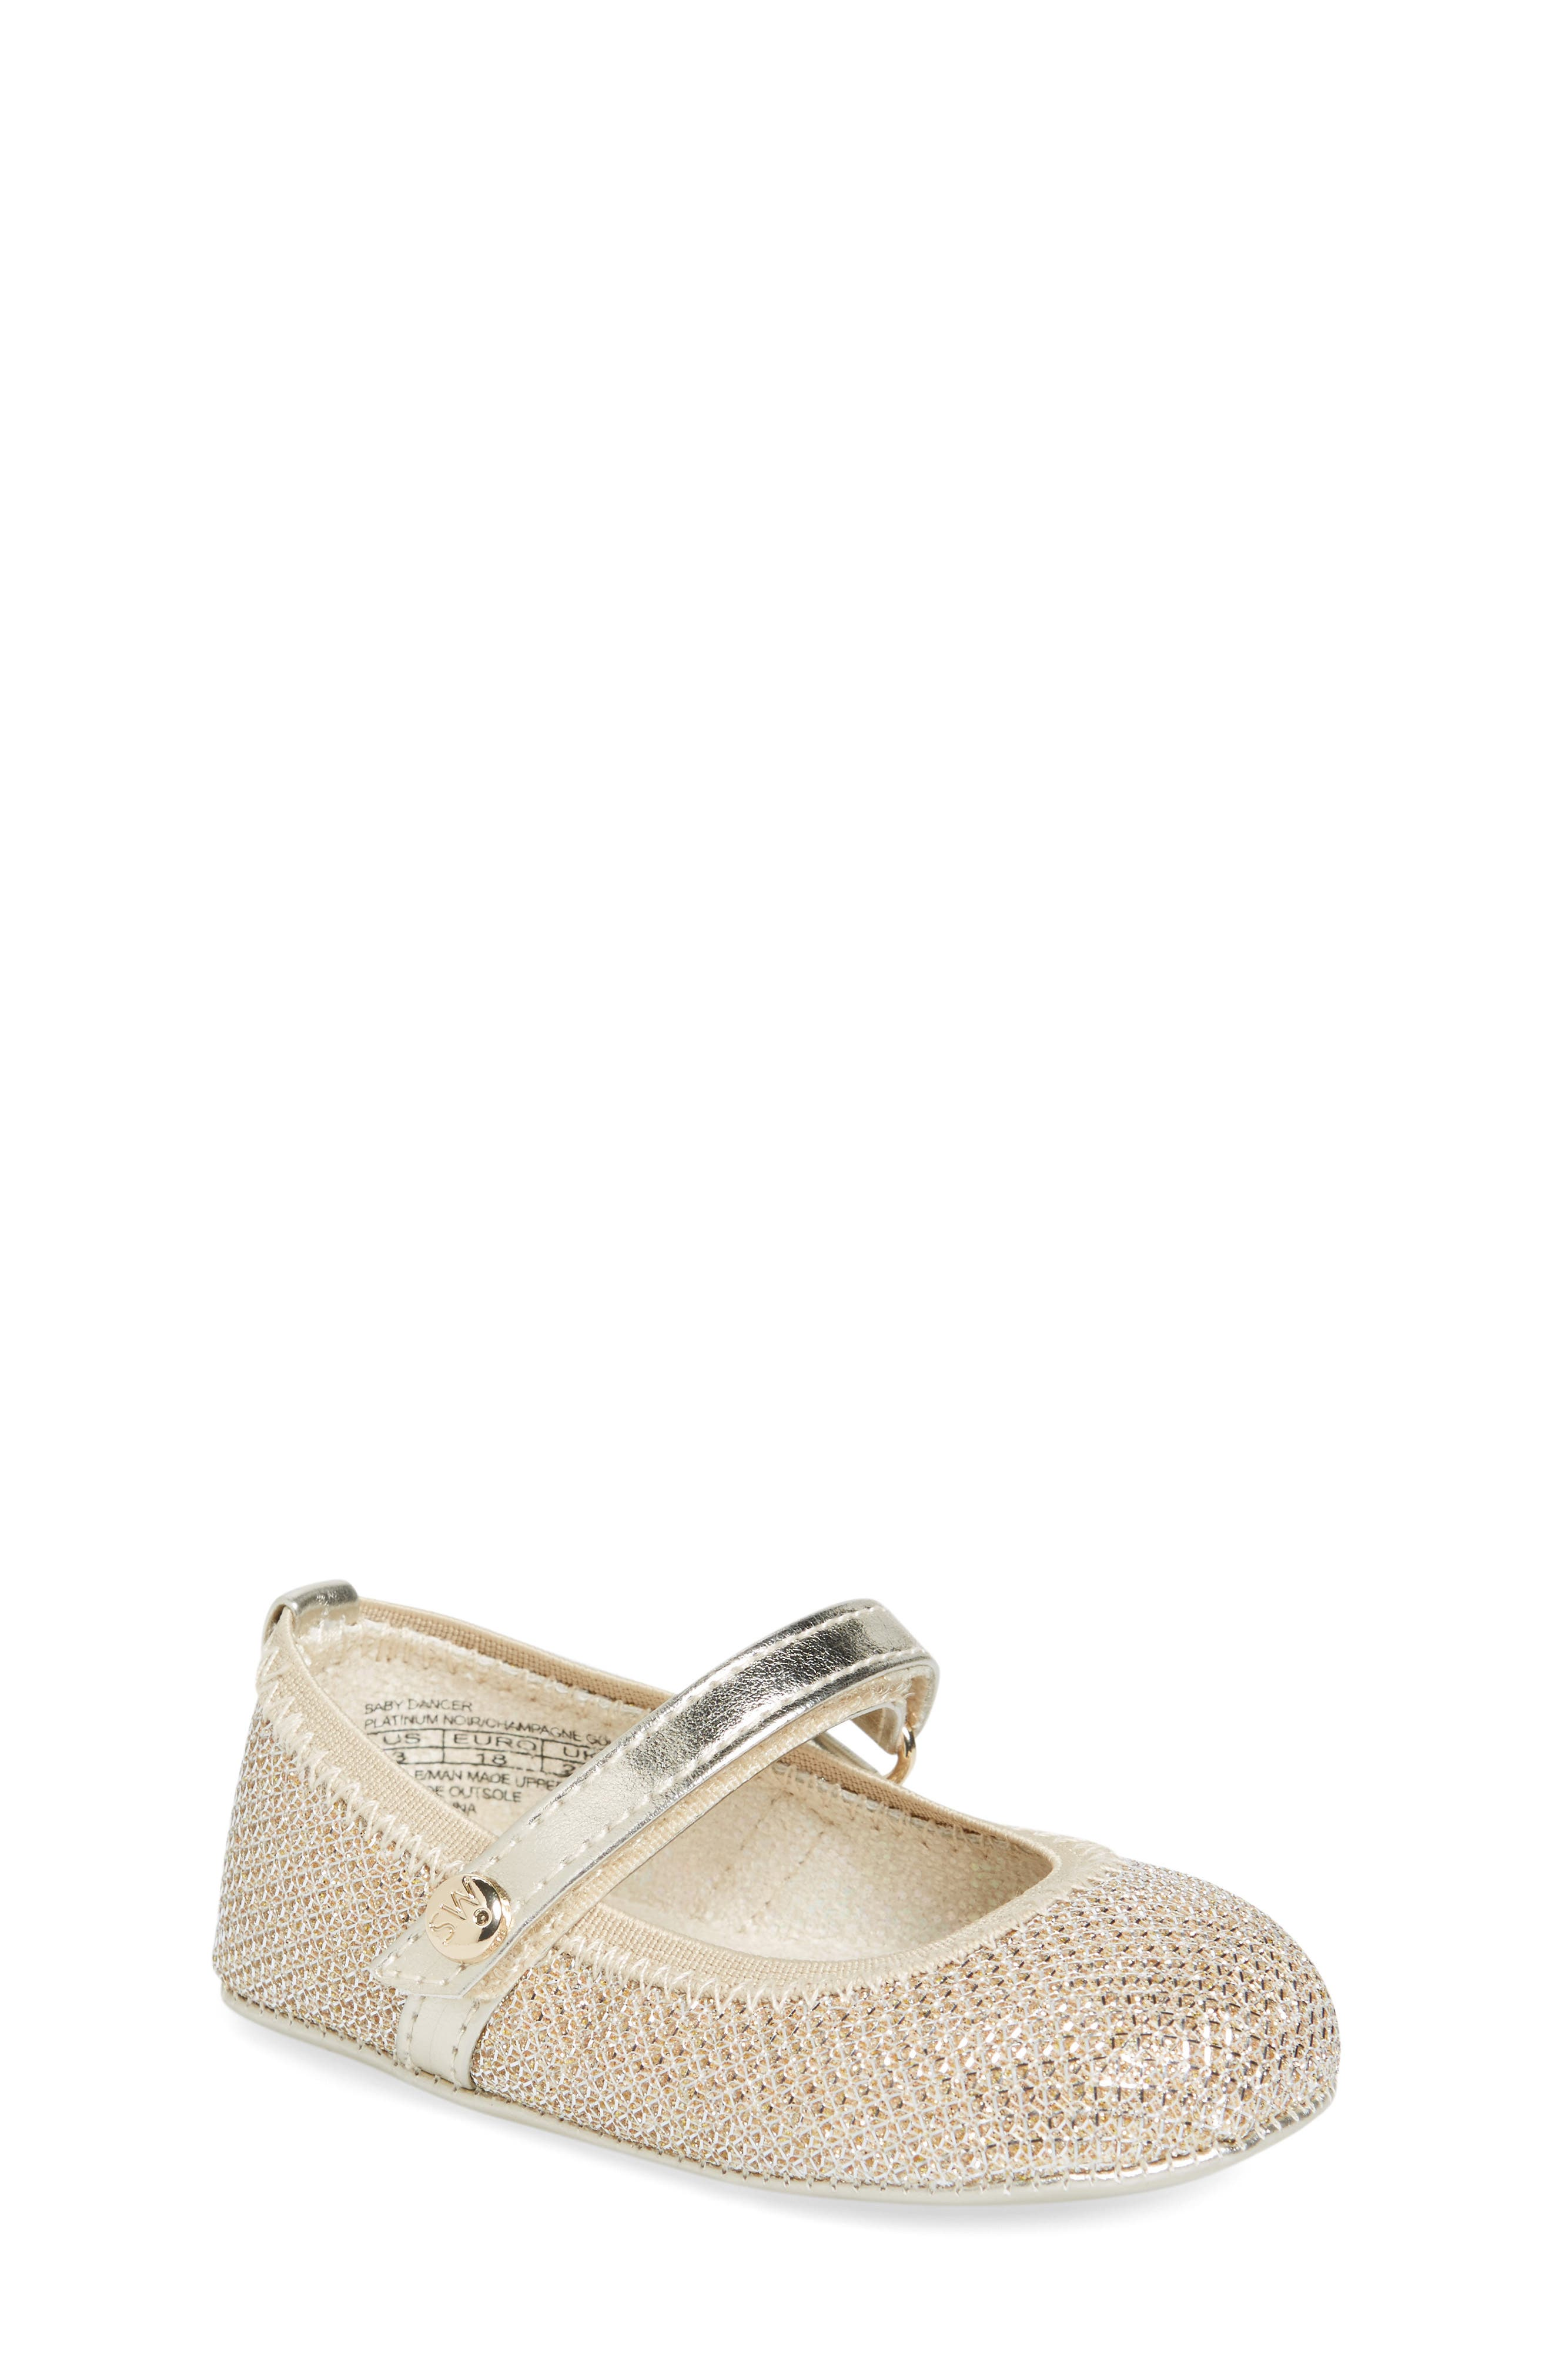 Stuart Weitzman Baby Dancer Crib Shoe (Baby)